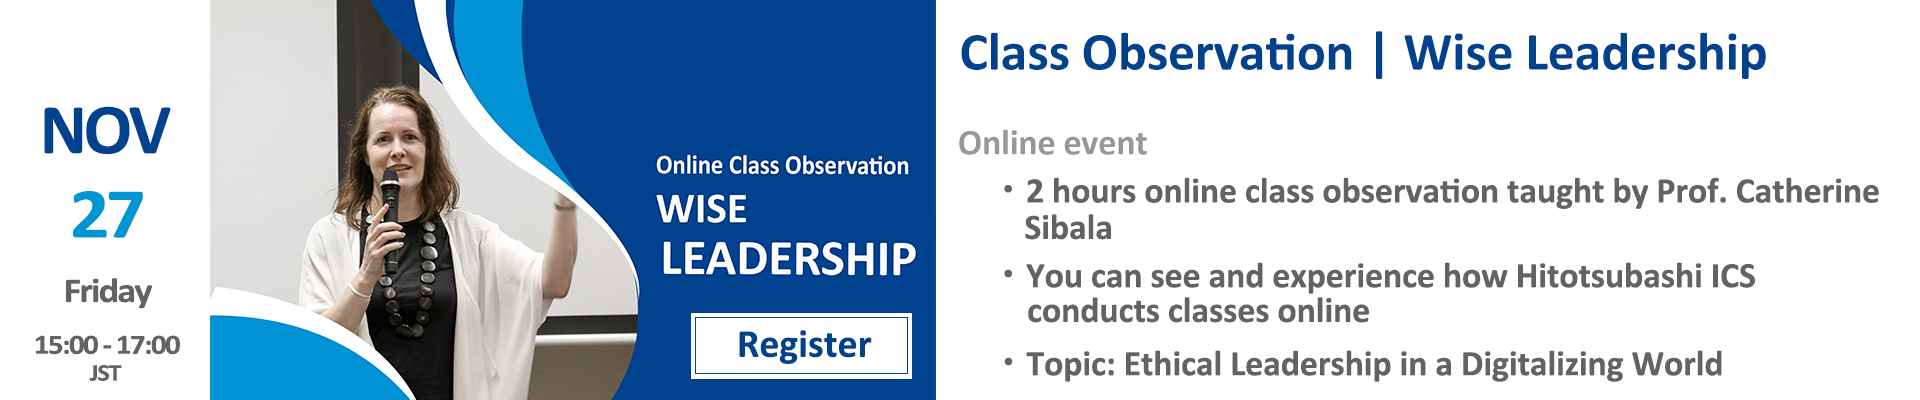 class observation wl